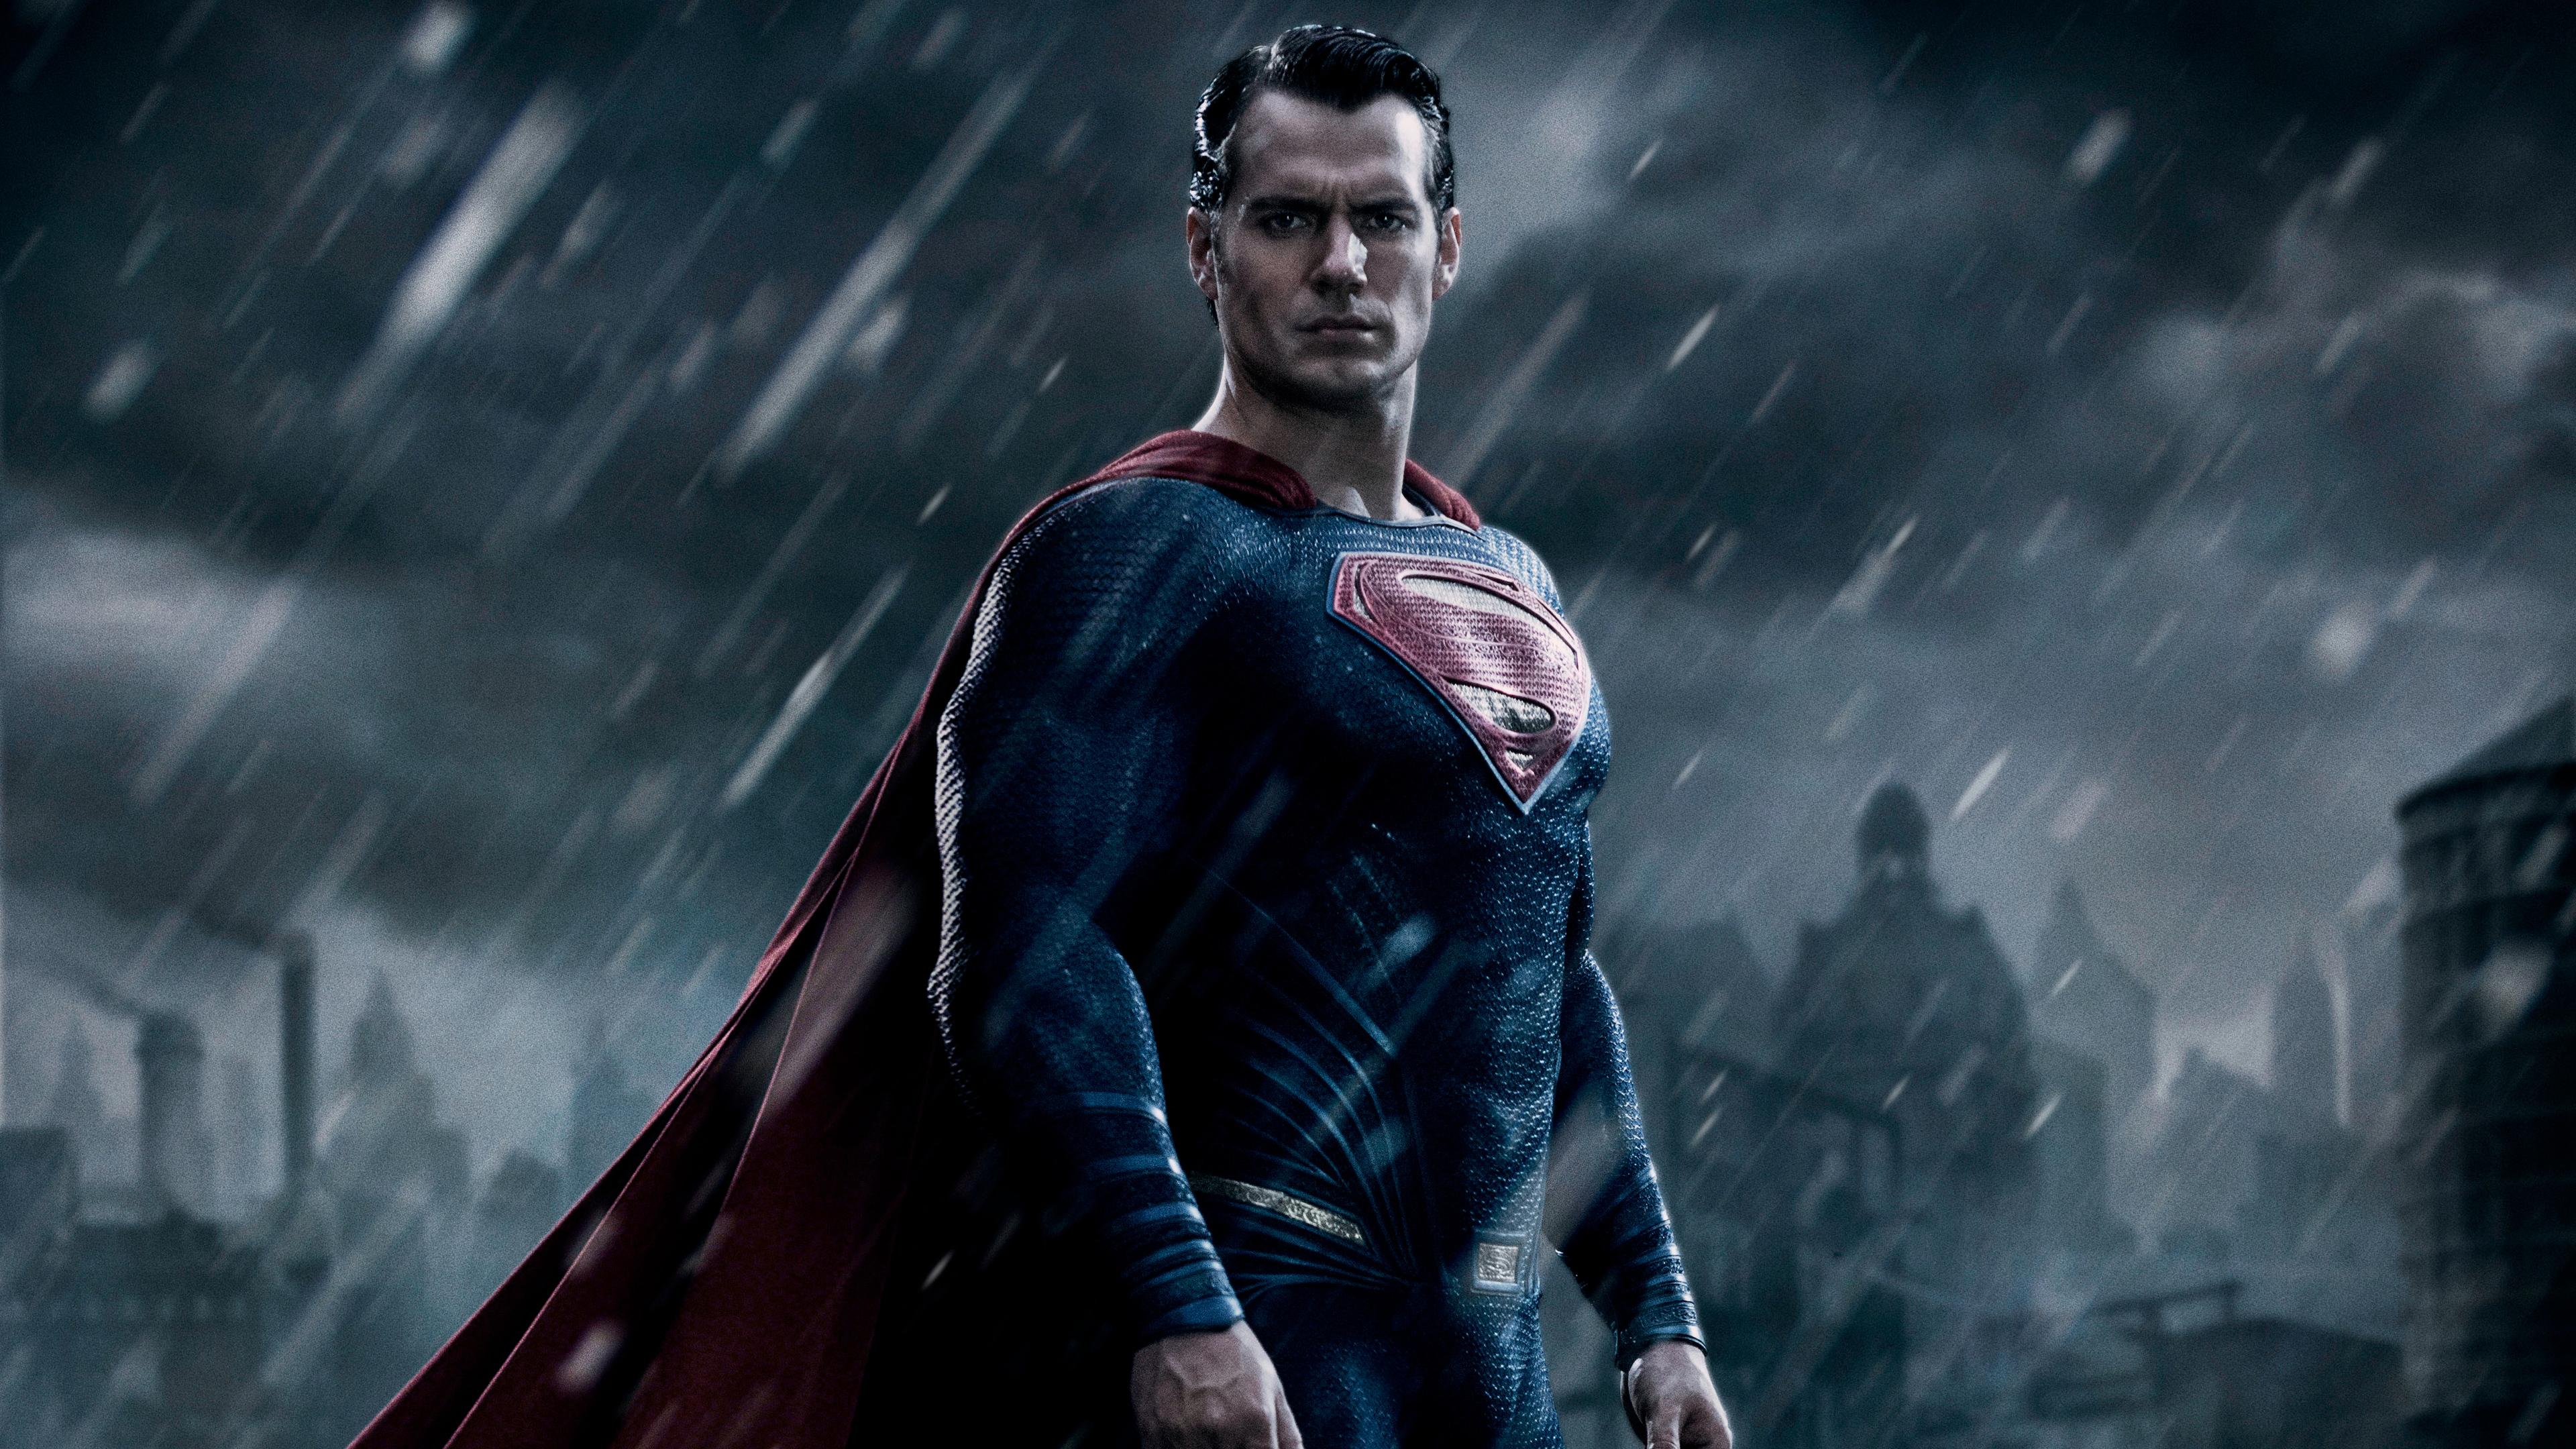 superman henry cavill in man of steel 4k 1555208707 - Superman Henry Cavill In Man Of Steel 4k - superman wallpapers, superheroes wallpapers, movies wallpapers, man of steel wallpapers, hd-wallpapers, 5k wallpapers, 4k-wallpapers